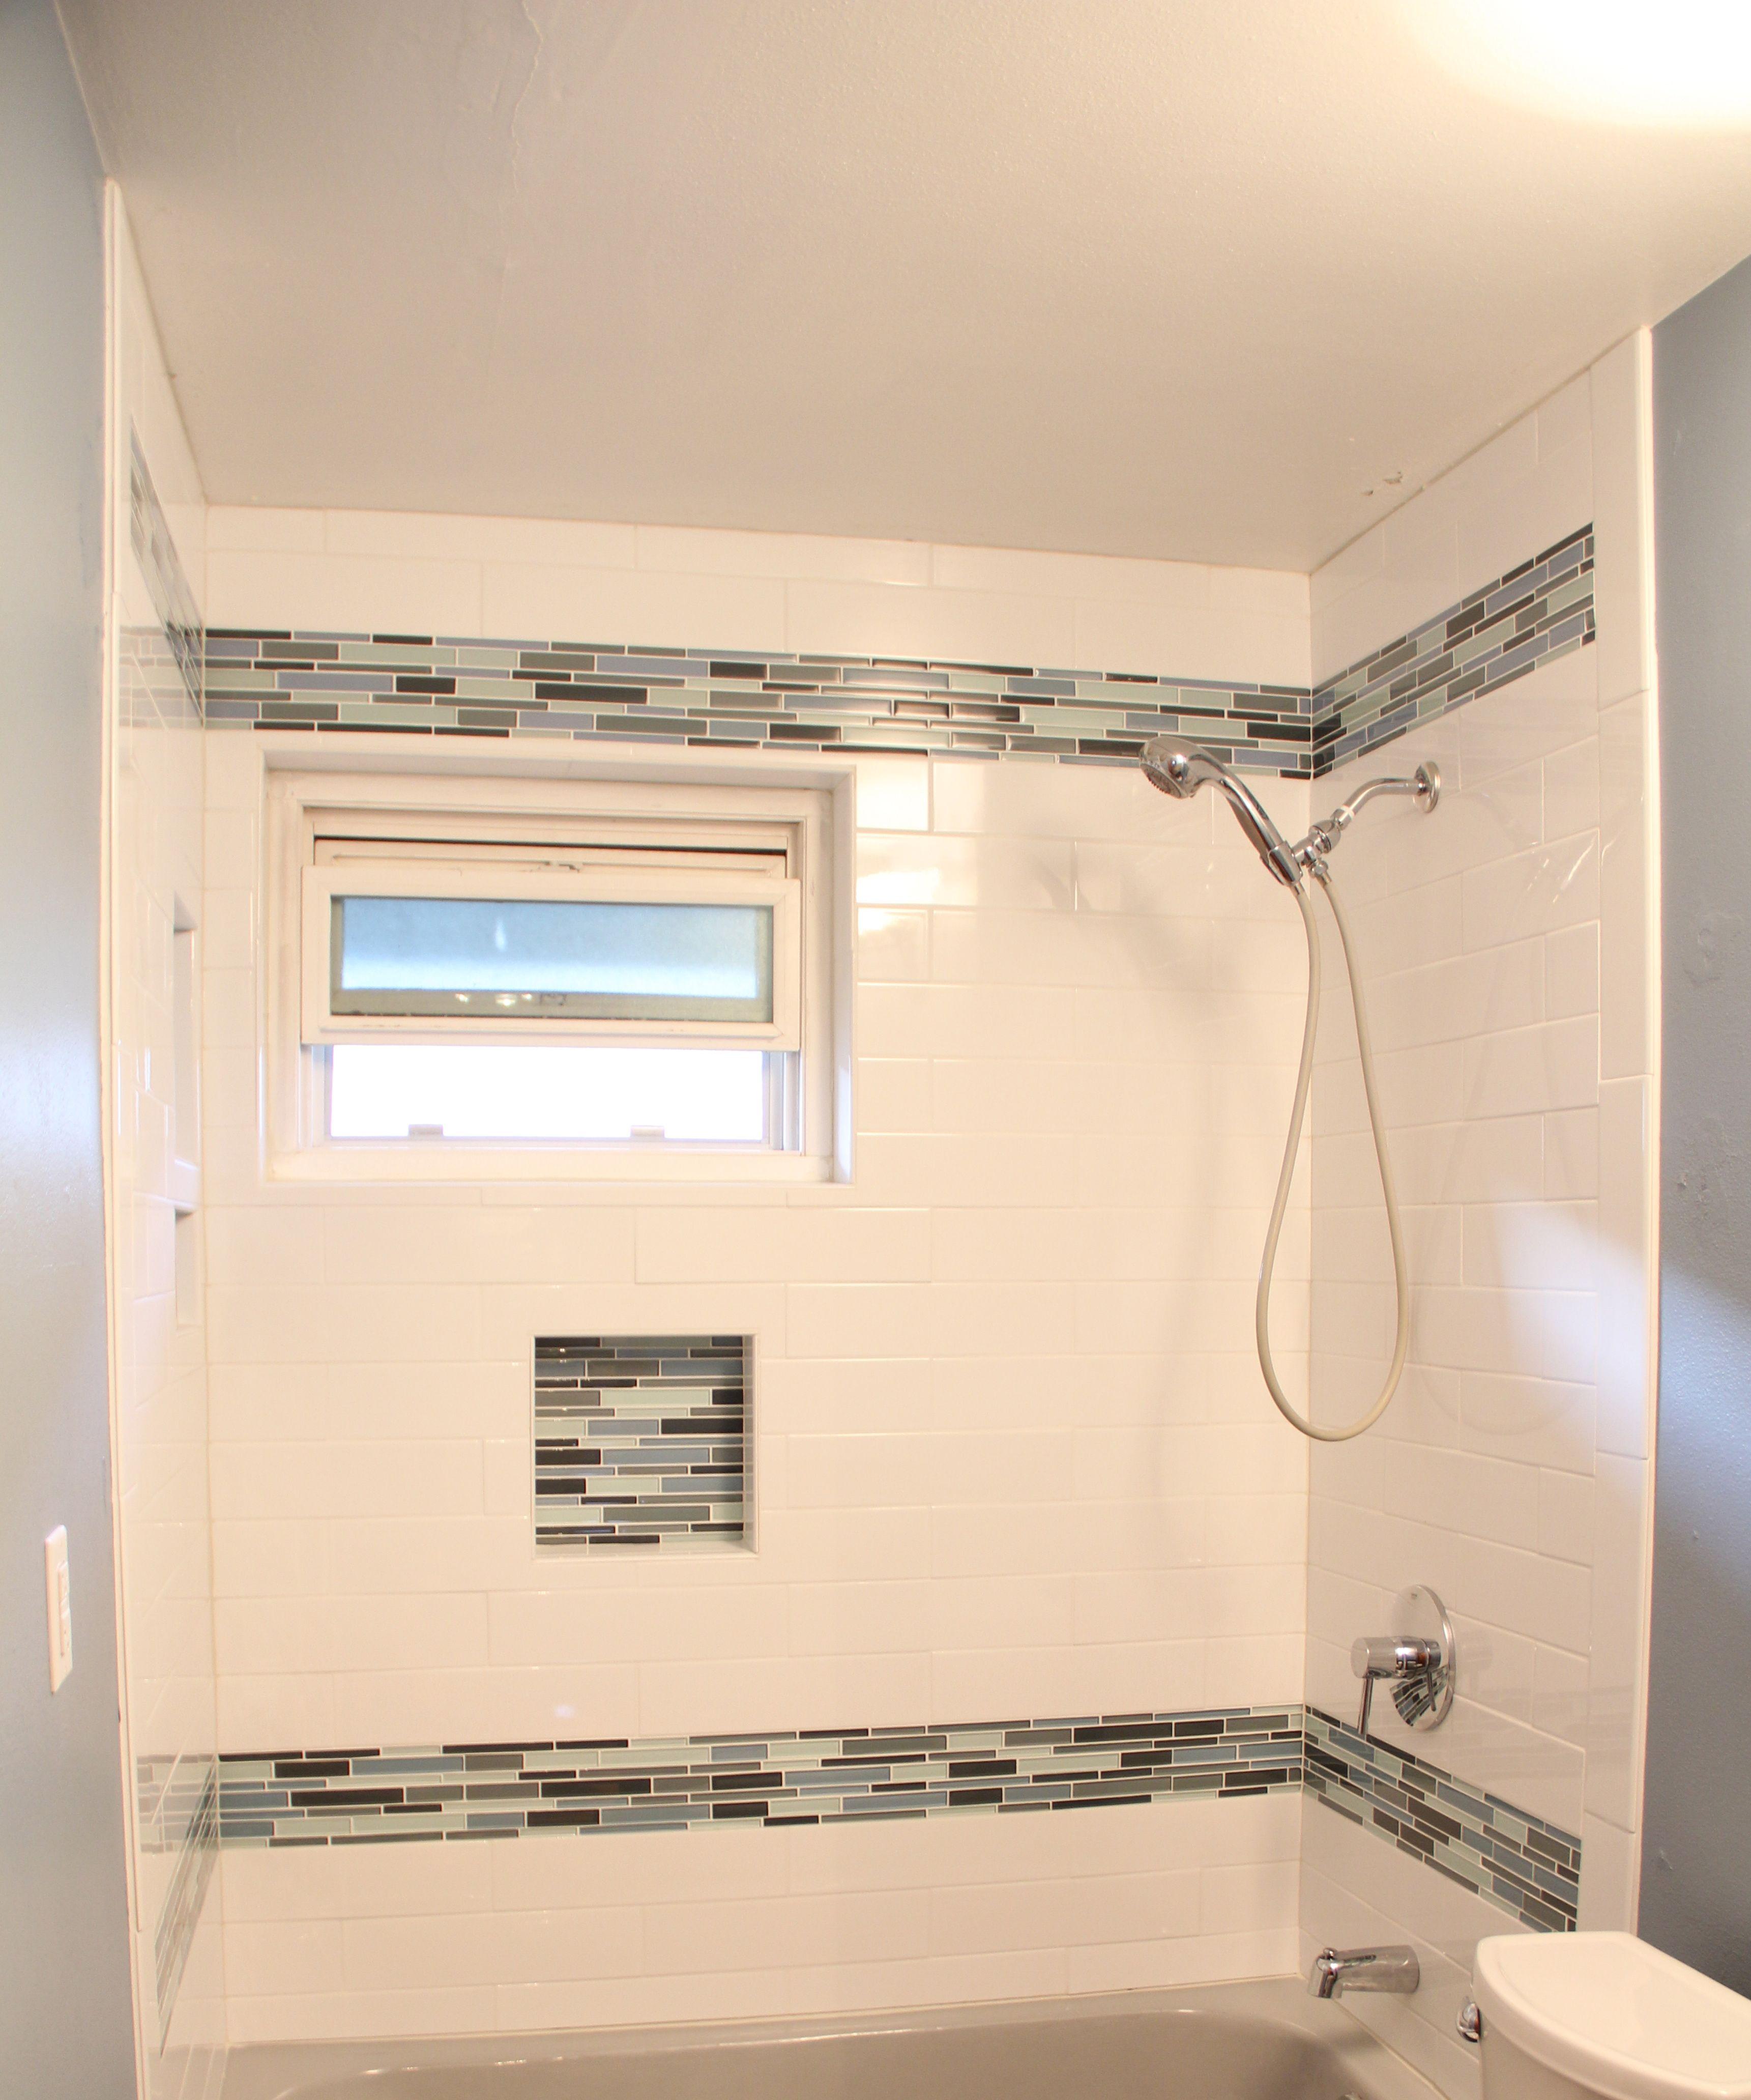 Bathroom Tile Ideas For Tub Surround : Shower surround tile bathroom ideas